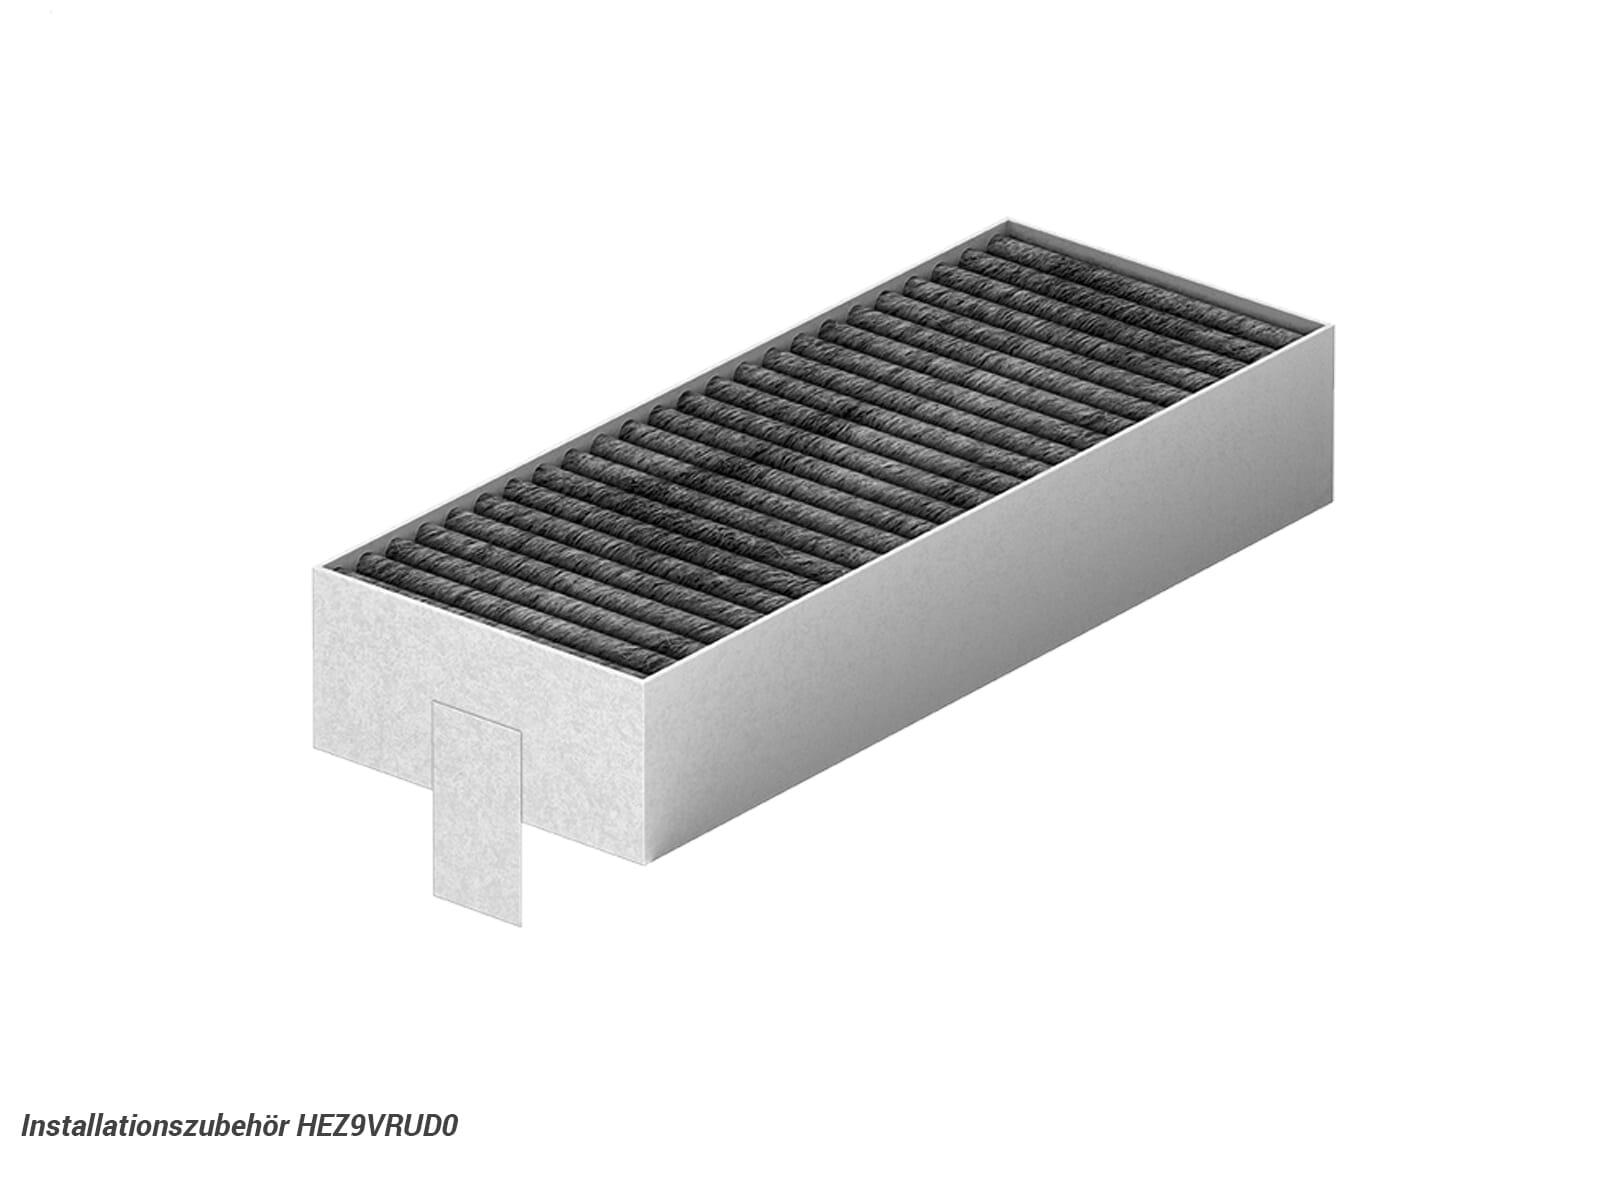 Bosch PVQ811U60 Induktionskochfeld-Dunstabzug-Kombination PVQ811F15E +  Installationszubehör